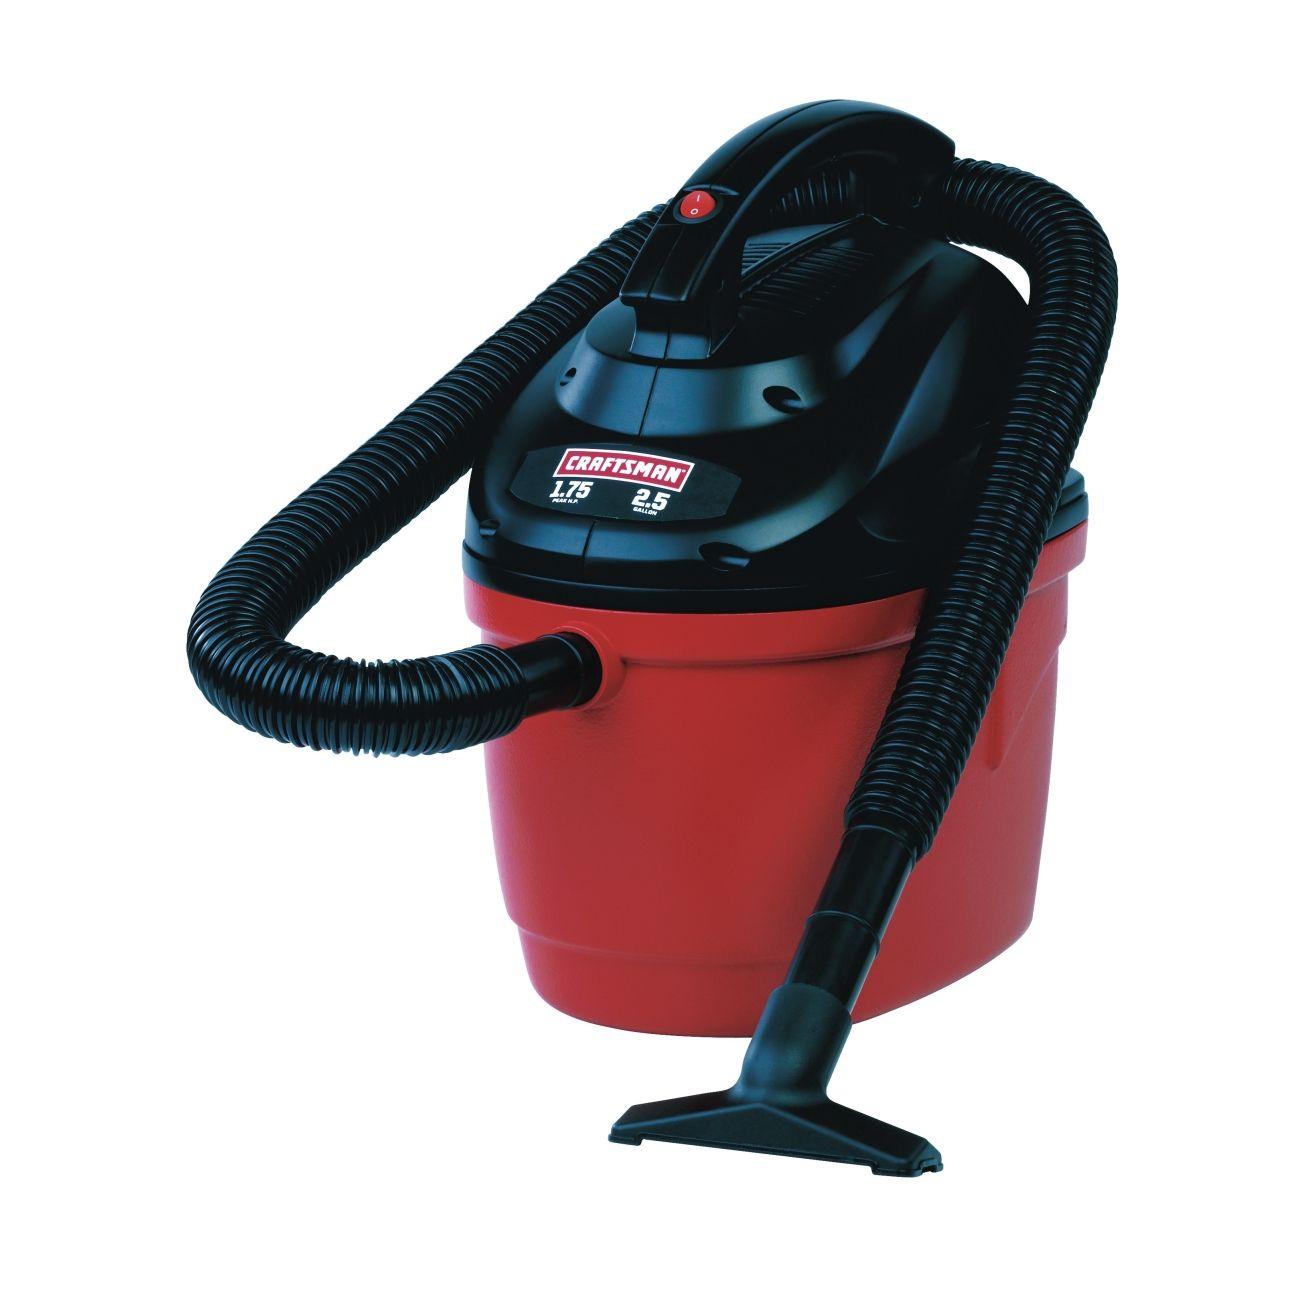 Leather work gloves ace hardware - Craftsman Gallon Wet Dry Vacuum Wet Dry Vacuums Ace Hardware